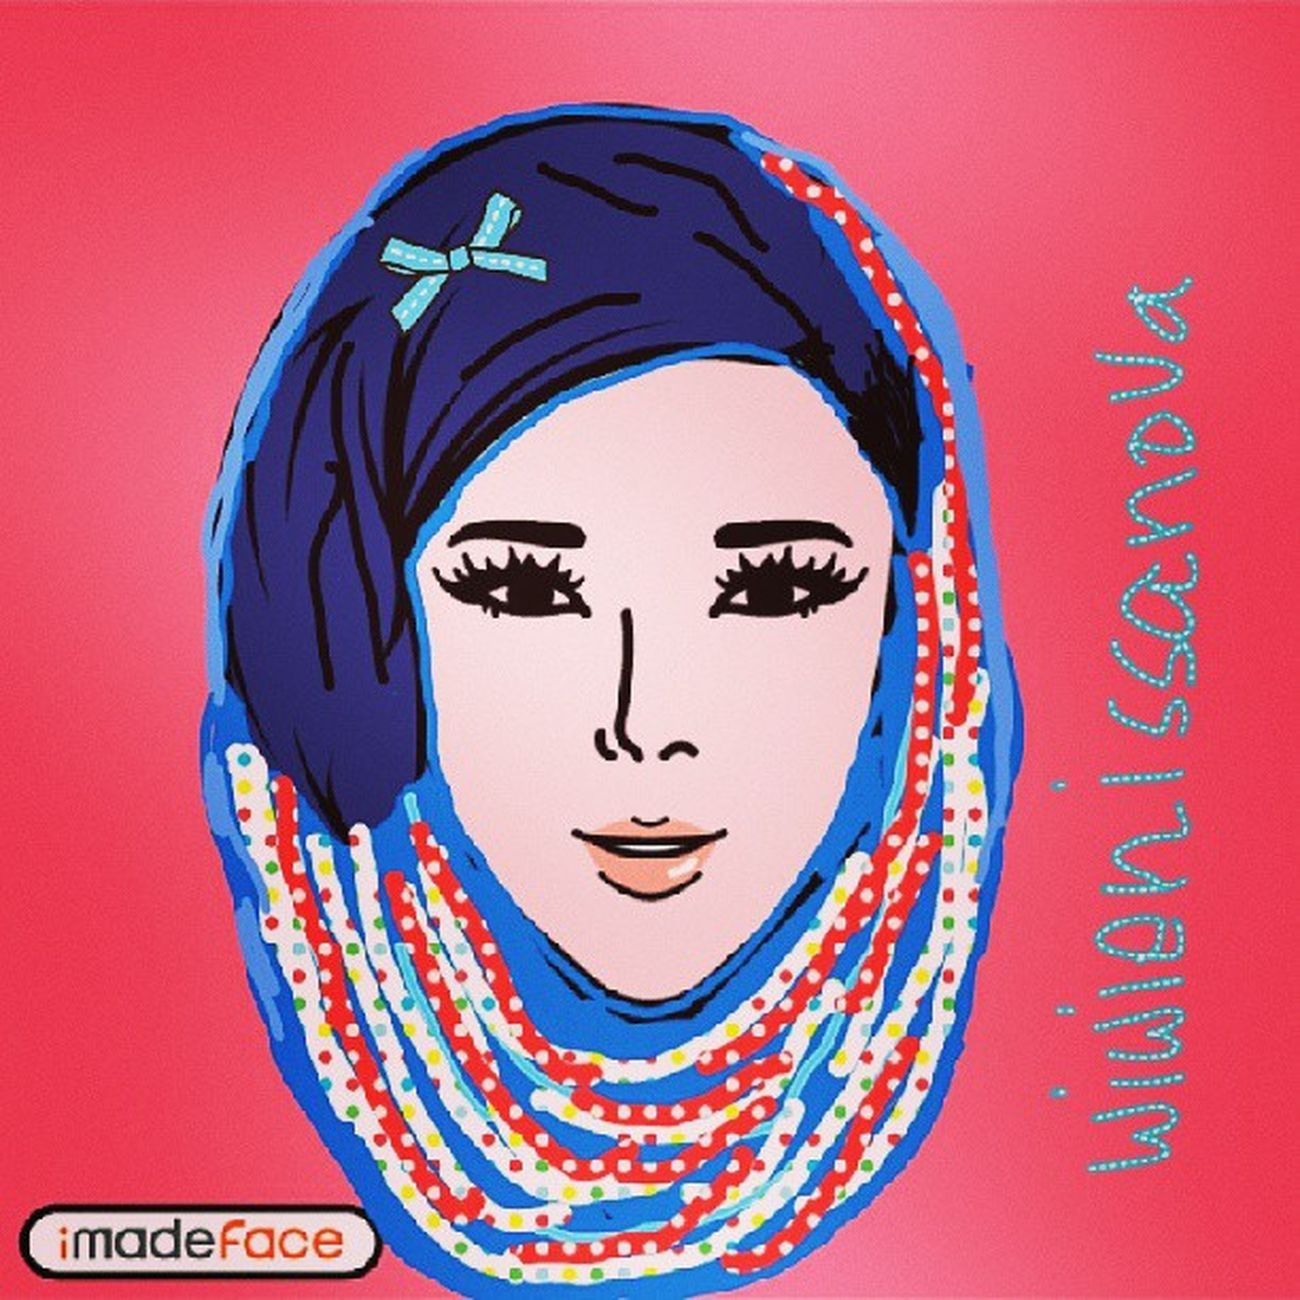 Hehehe finally I can make it... my first Imadeface Imadefacewithhijab Imadefacehijab Alfanova wnehijab wne1109